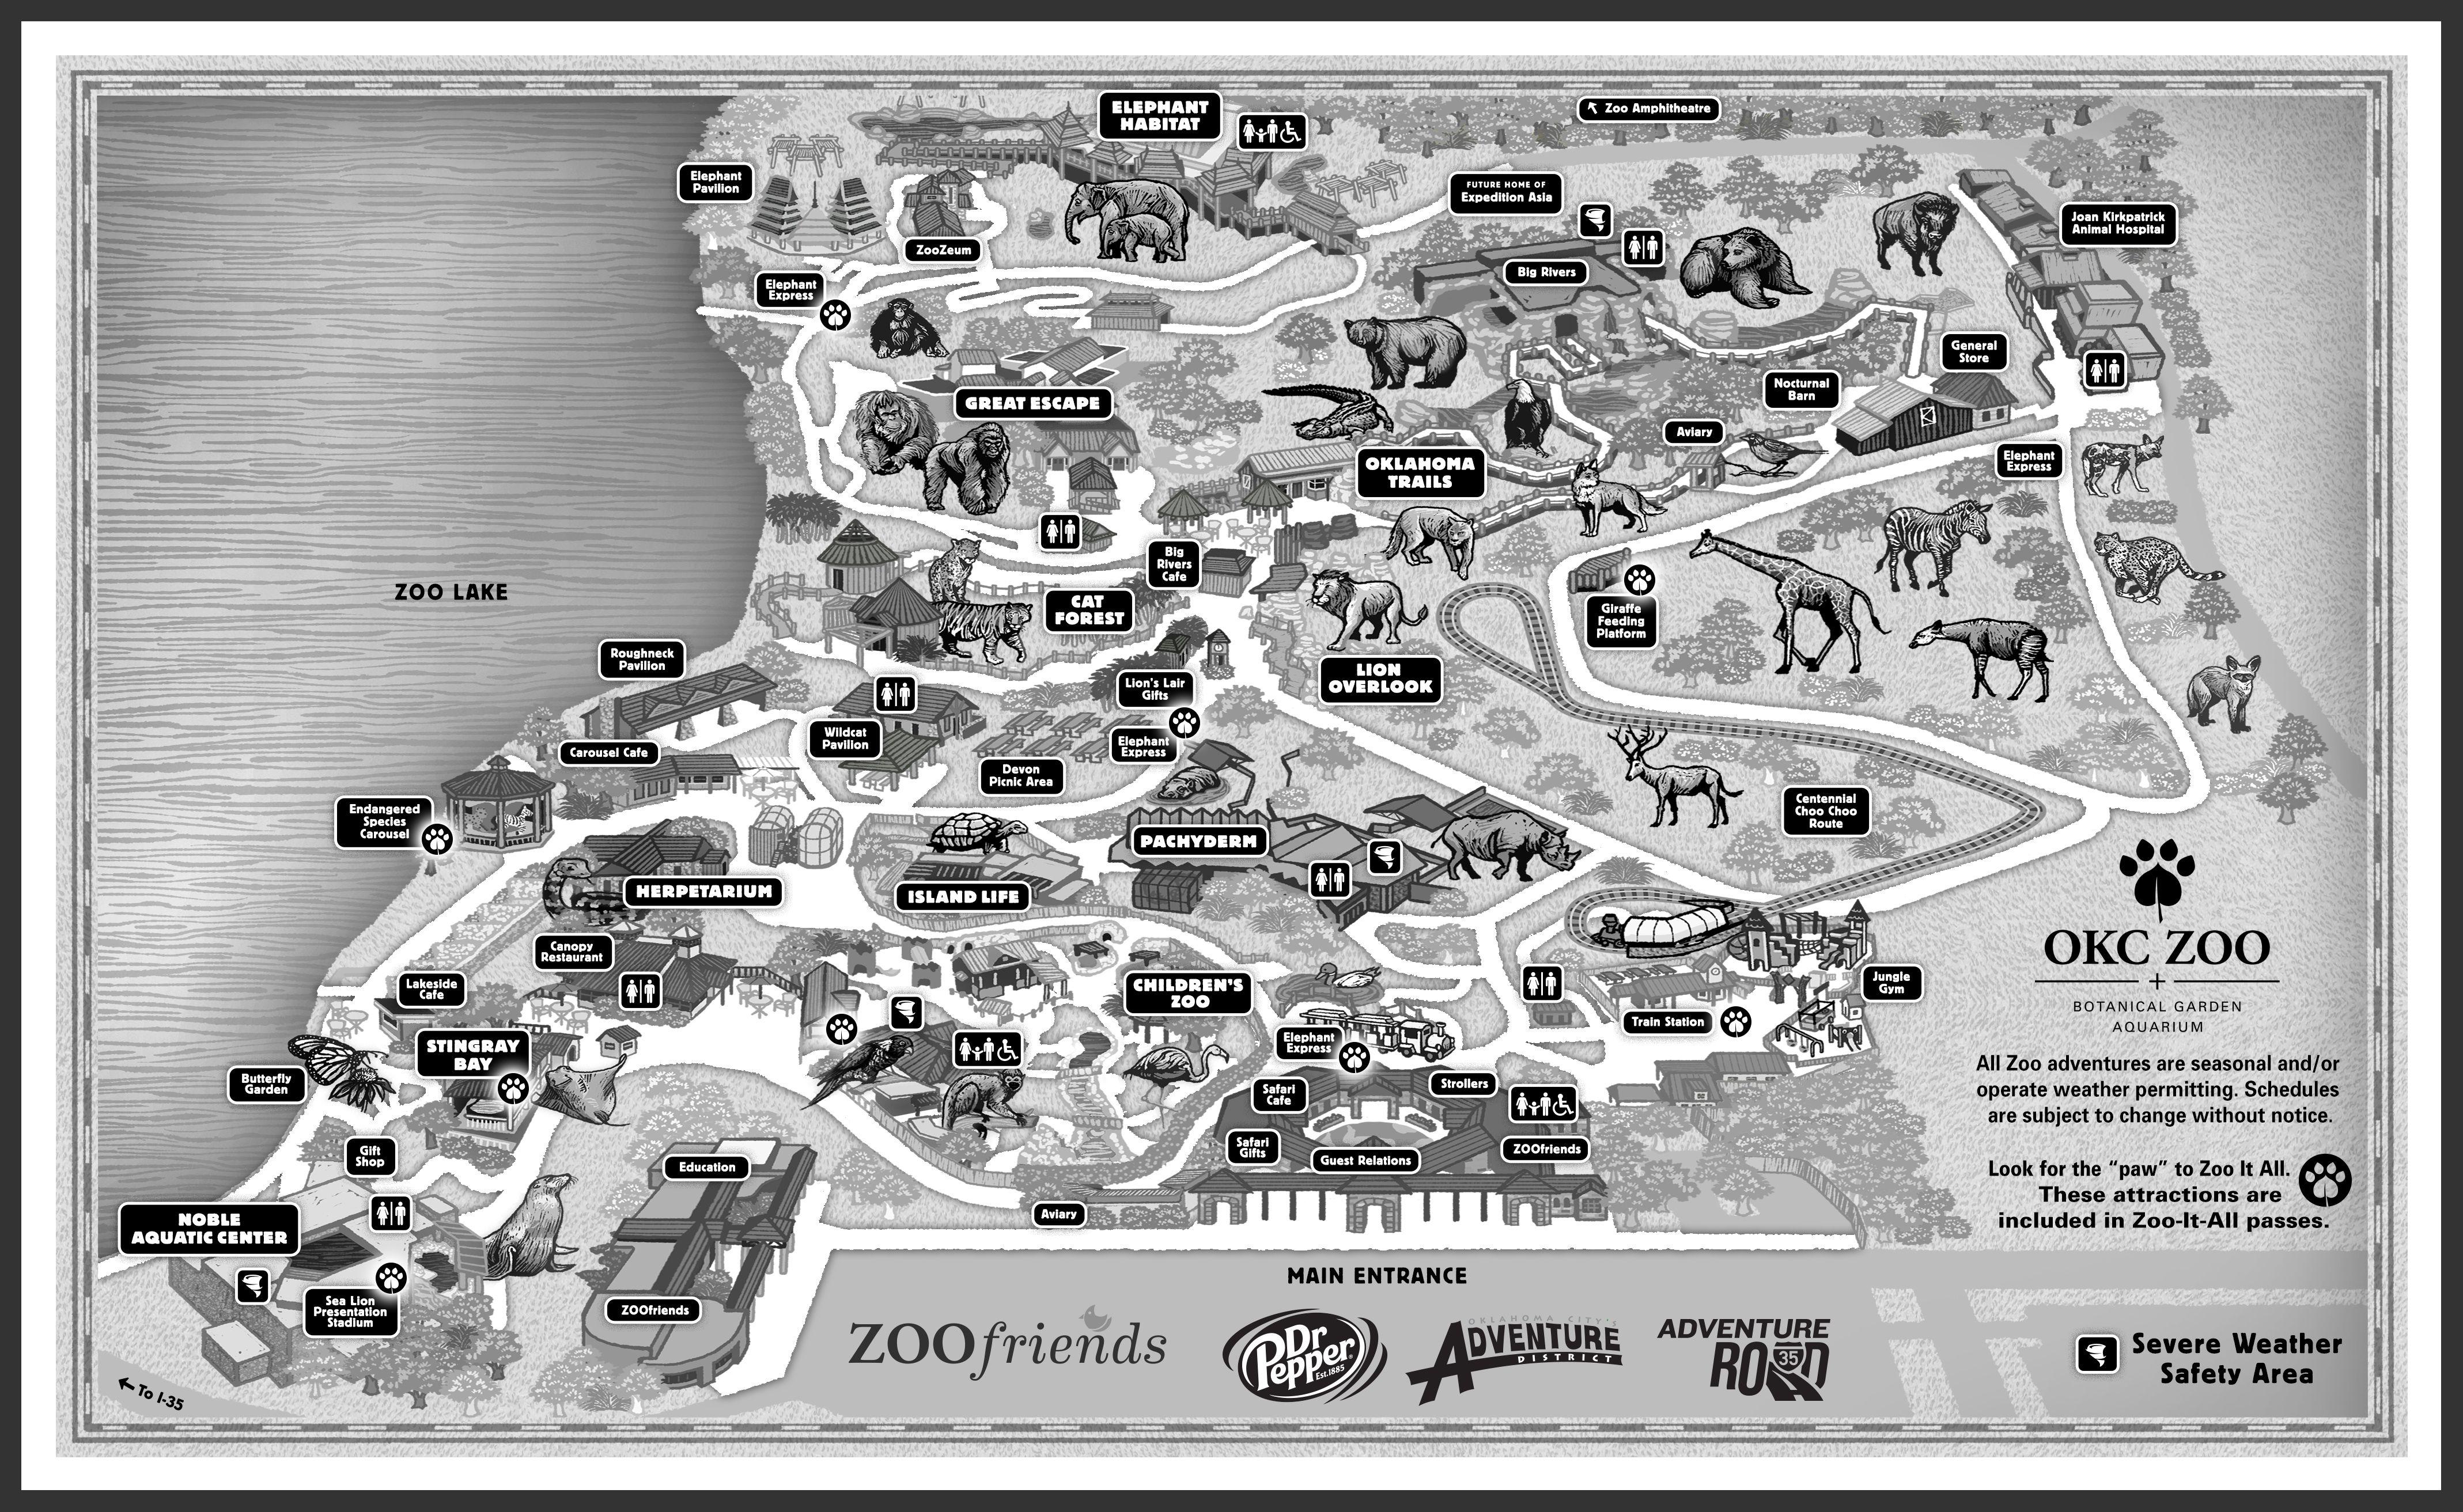 Visit the OKC Zoo Open 900 AM 500 PM Vacation Pinterest